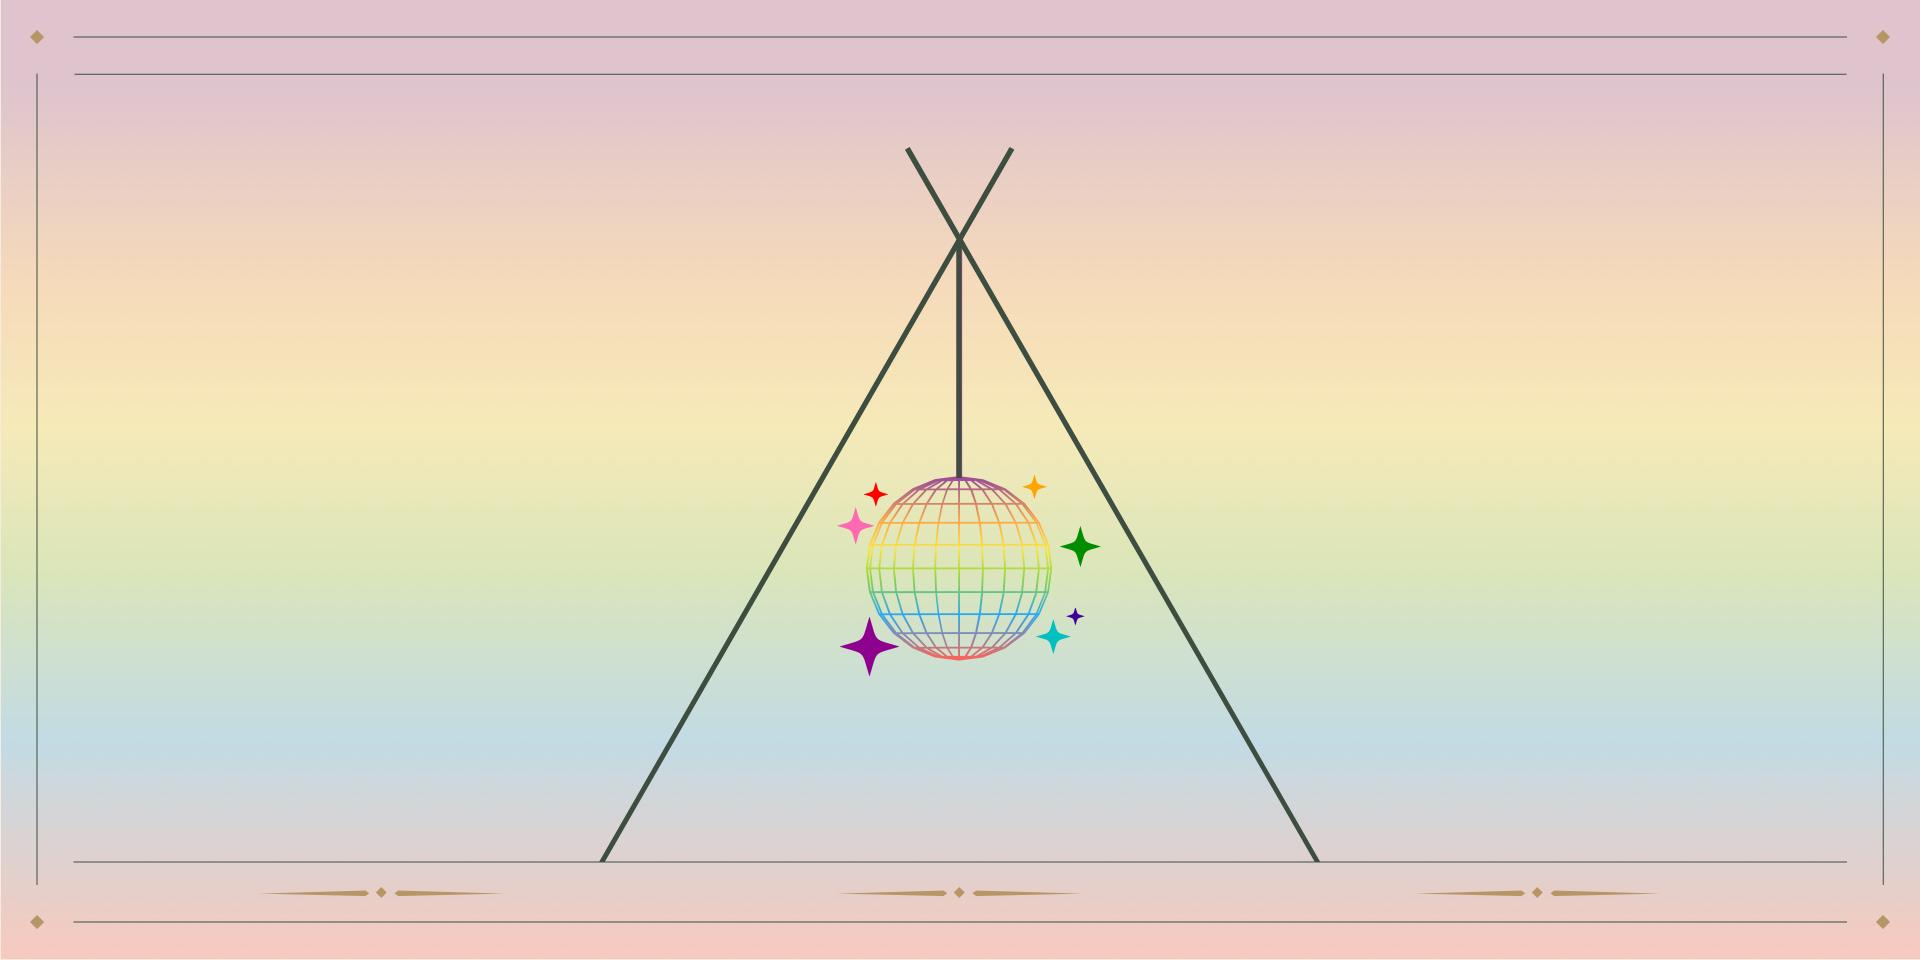 Disco ball tent